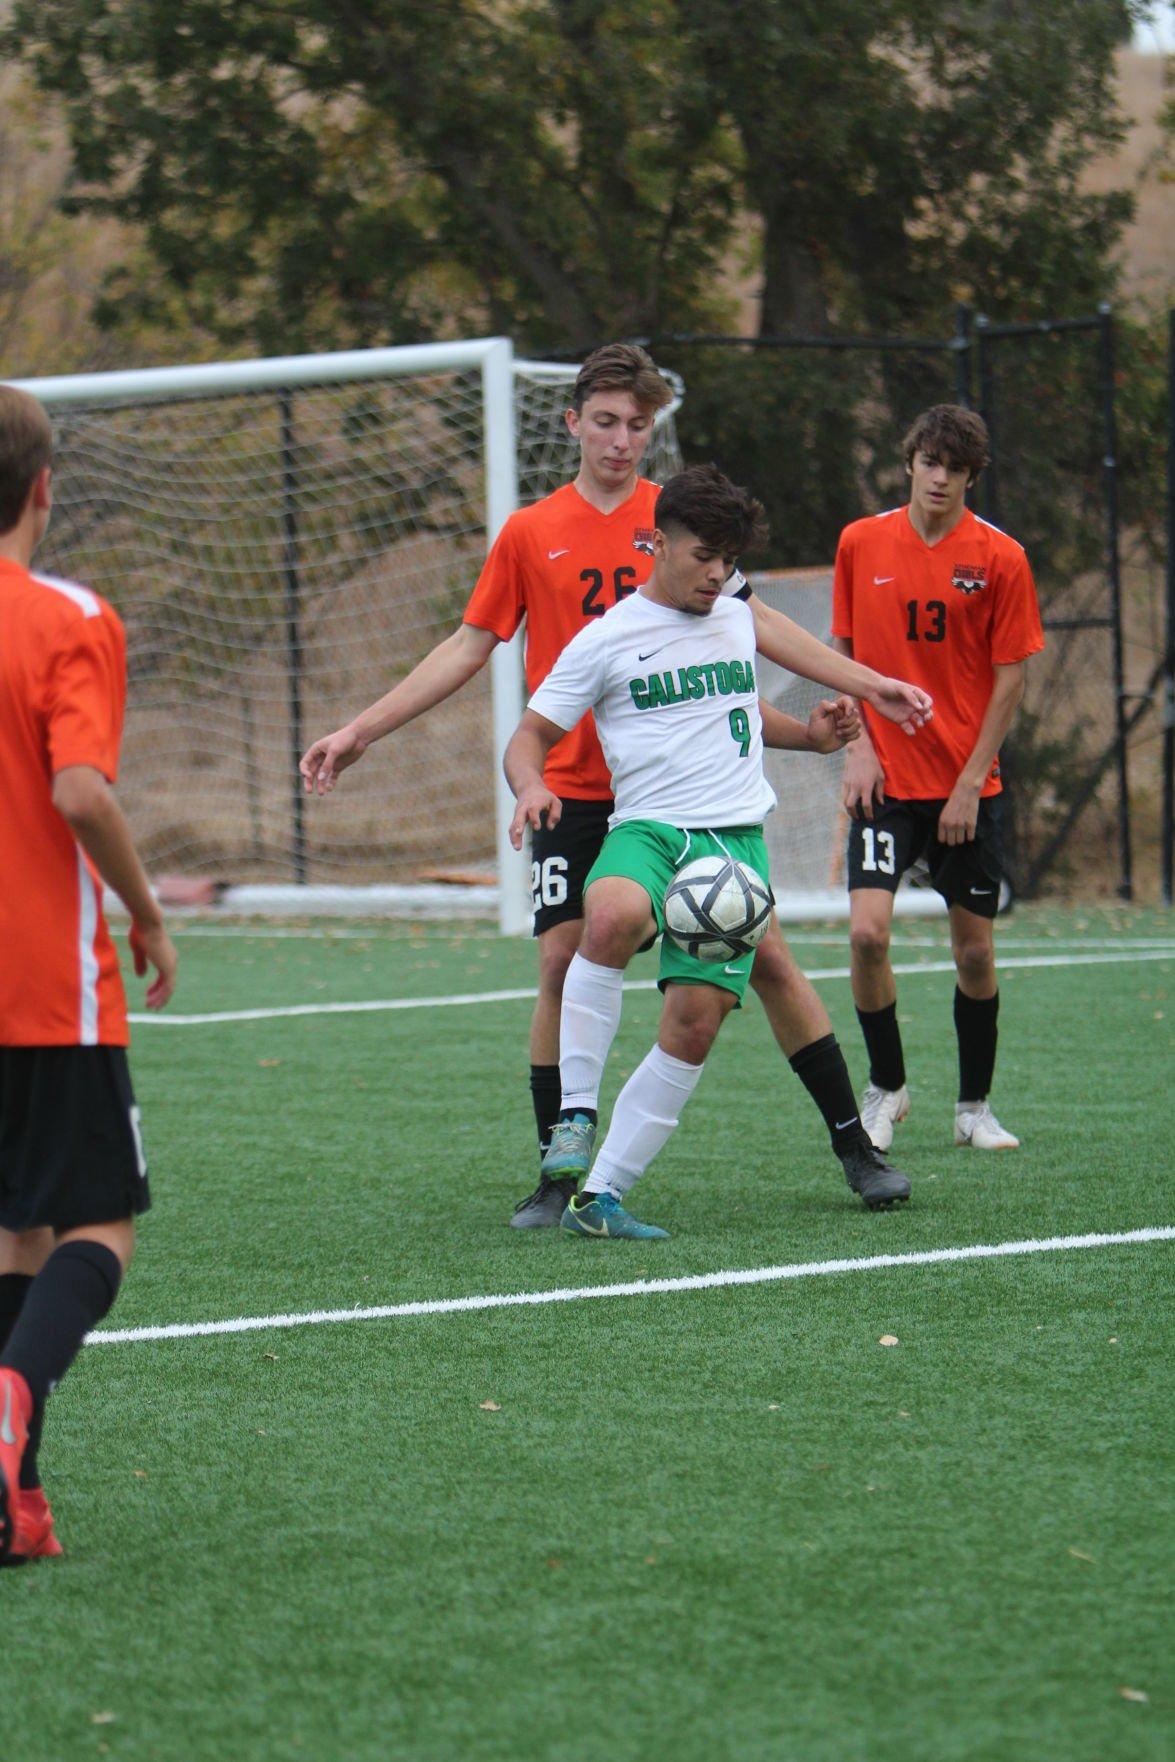 Calistoga boys soccer playoffs